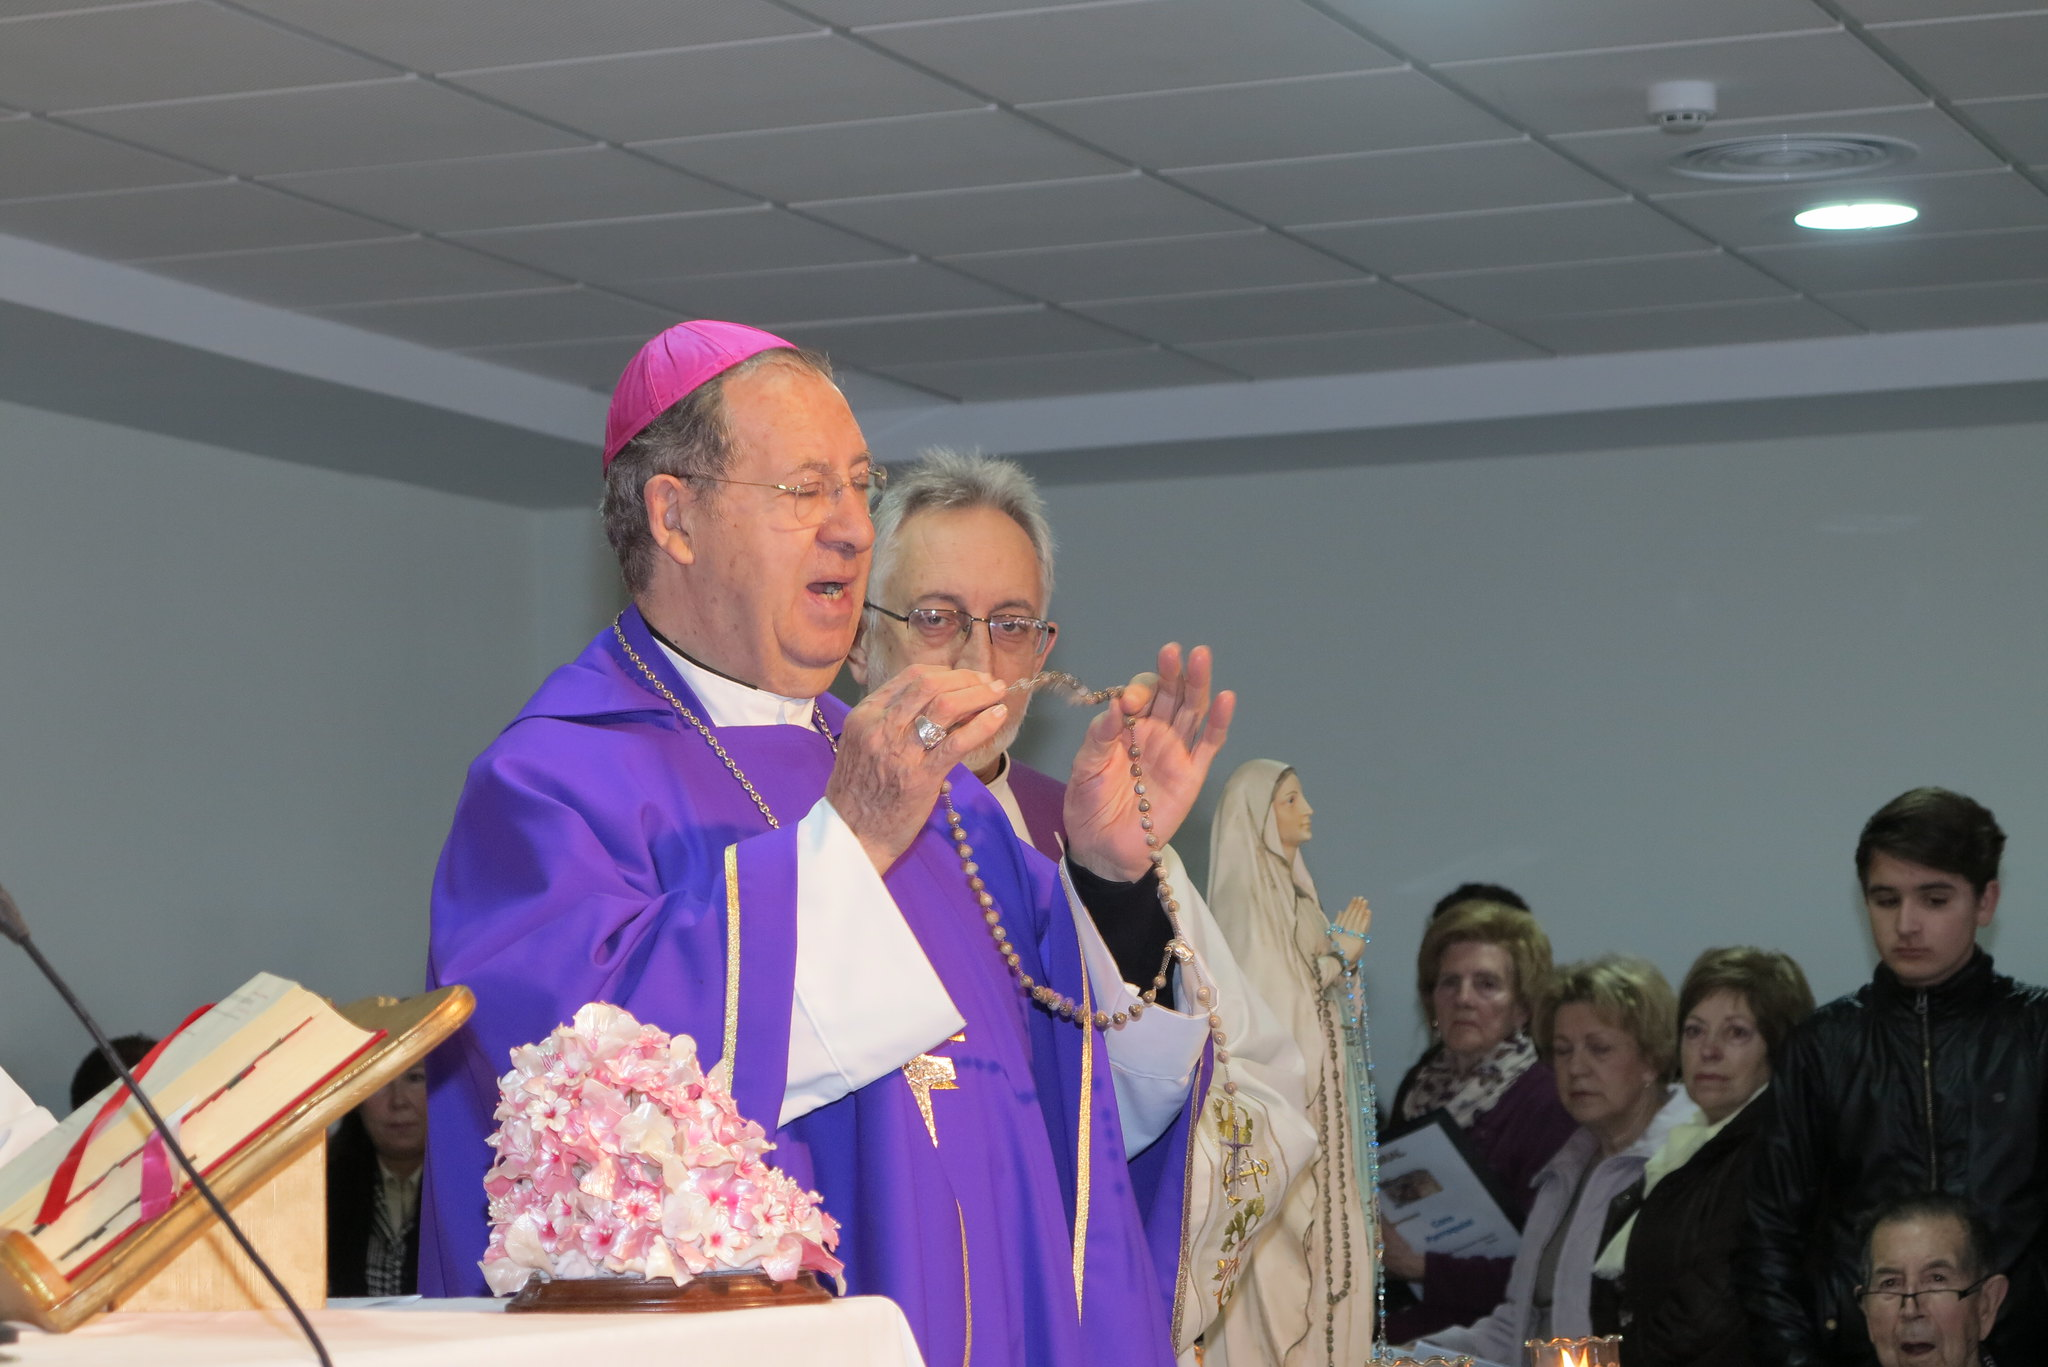 (2016-02-13) - Inauguración Virgen de Lourdes, La Molineta - Archivo La Molineta 2 (27)